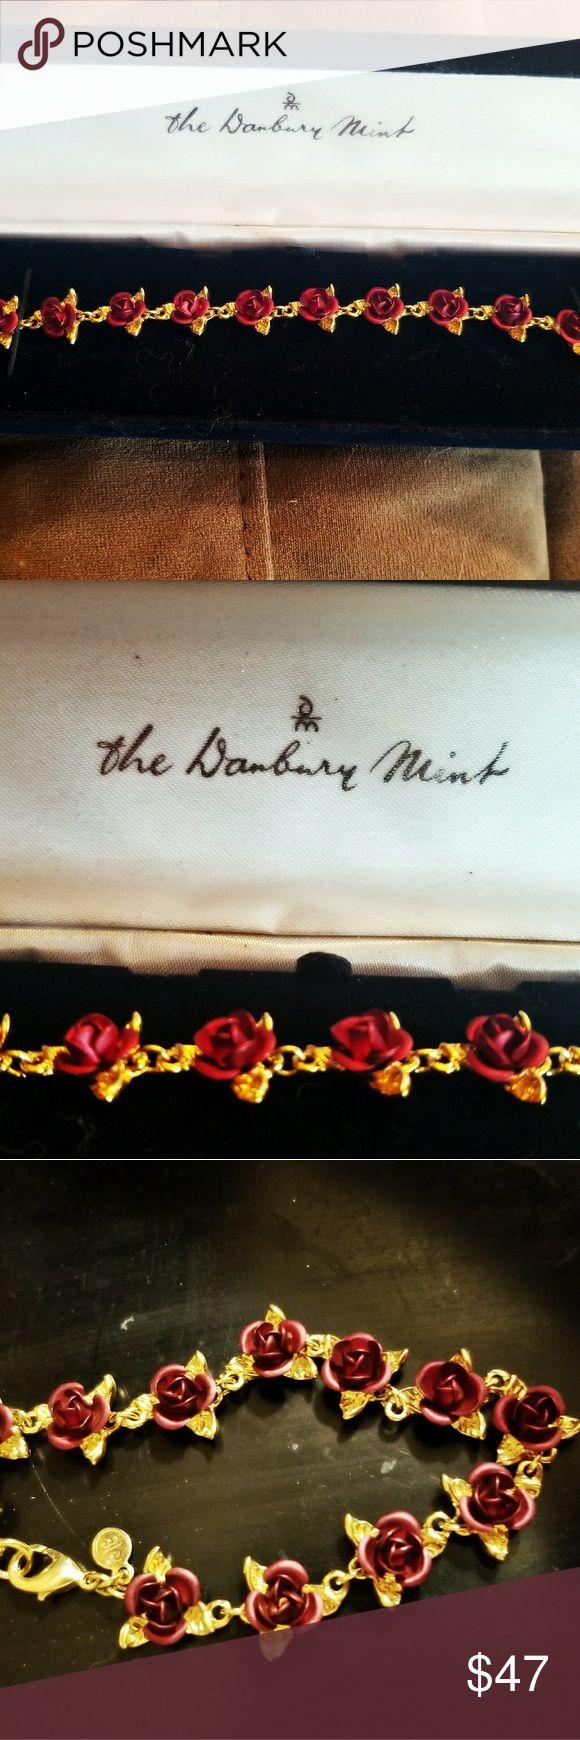 Danbury Mint bracelet 14k gold This is the dozen roses bracelet by Danbury Mint. 14k gold. Perfect condition. Intricately designed roses. Brand new. danbury mint Jewelry Bracelets